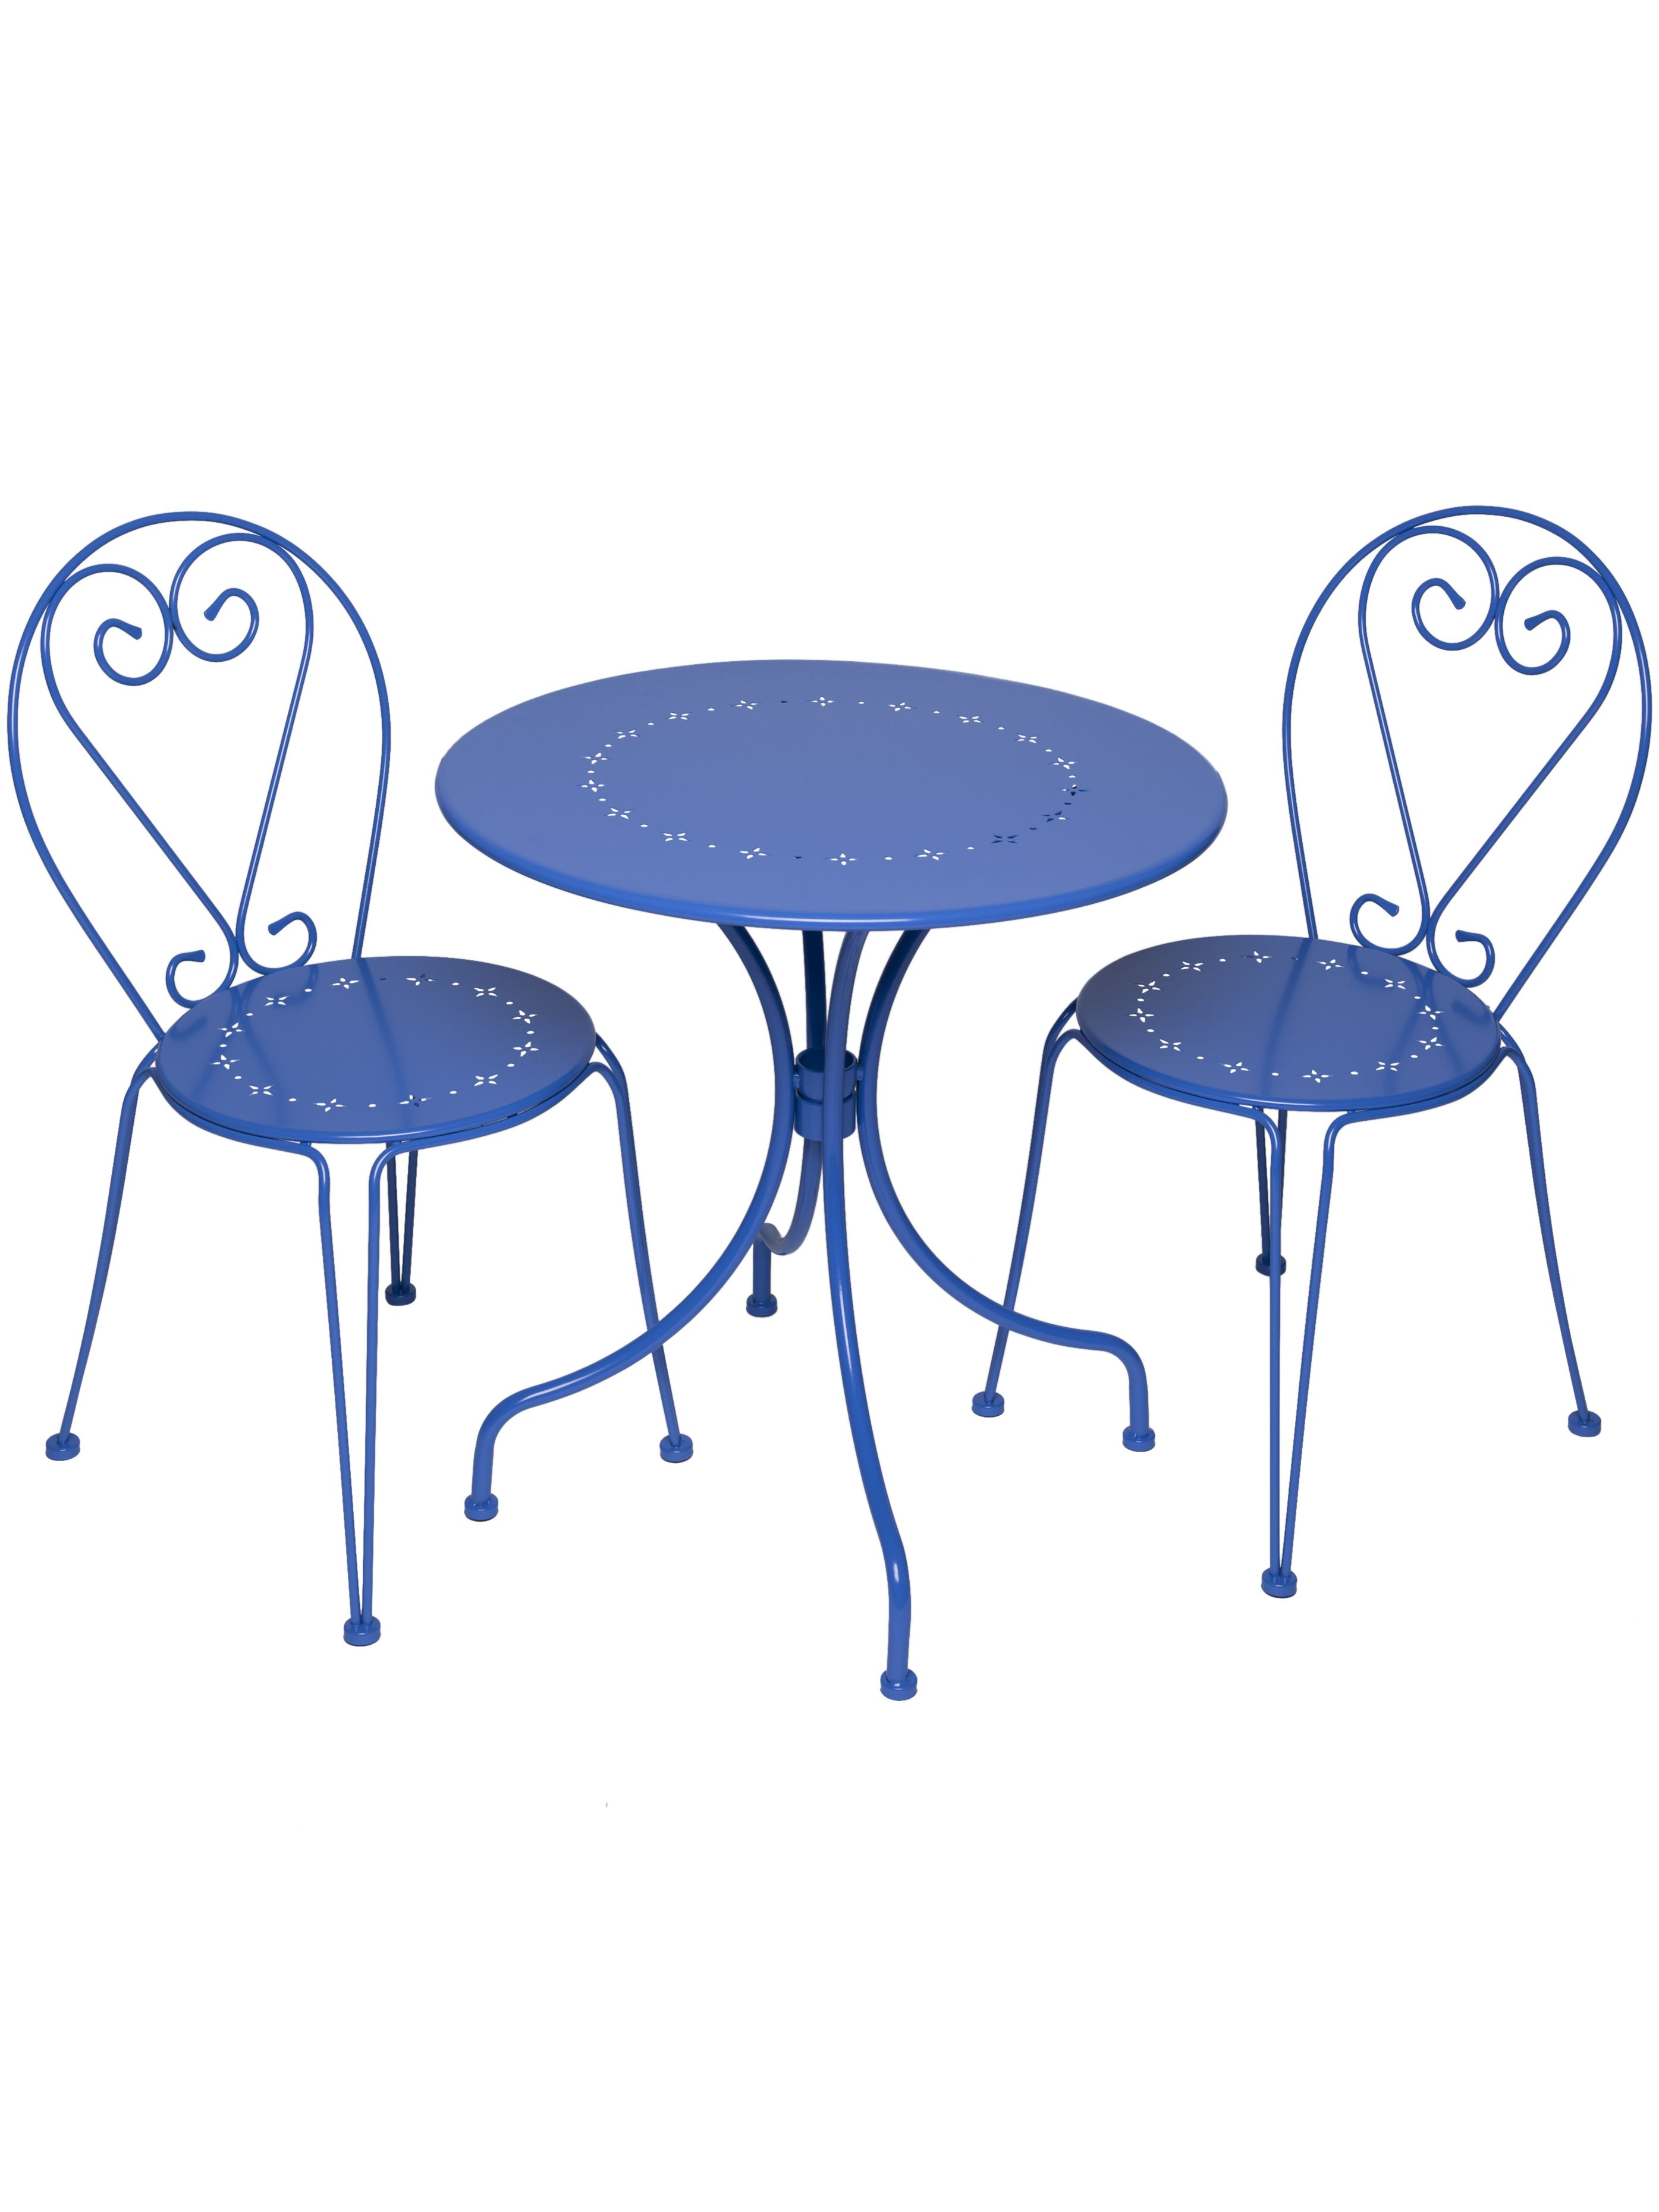 Bistro Set | Products | Pinterest | Muebles de metal, Hierro y ...